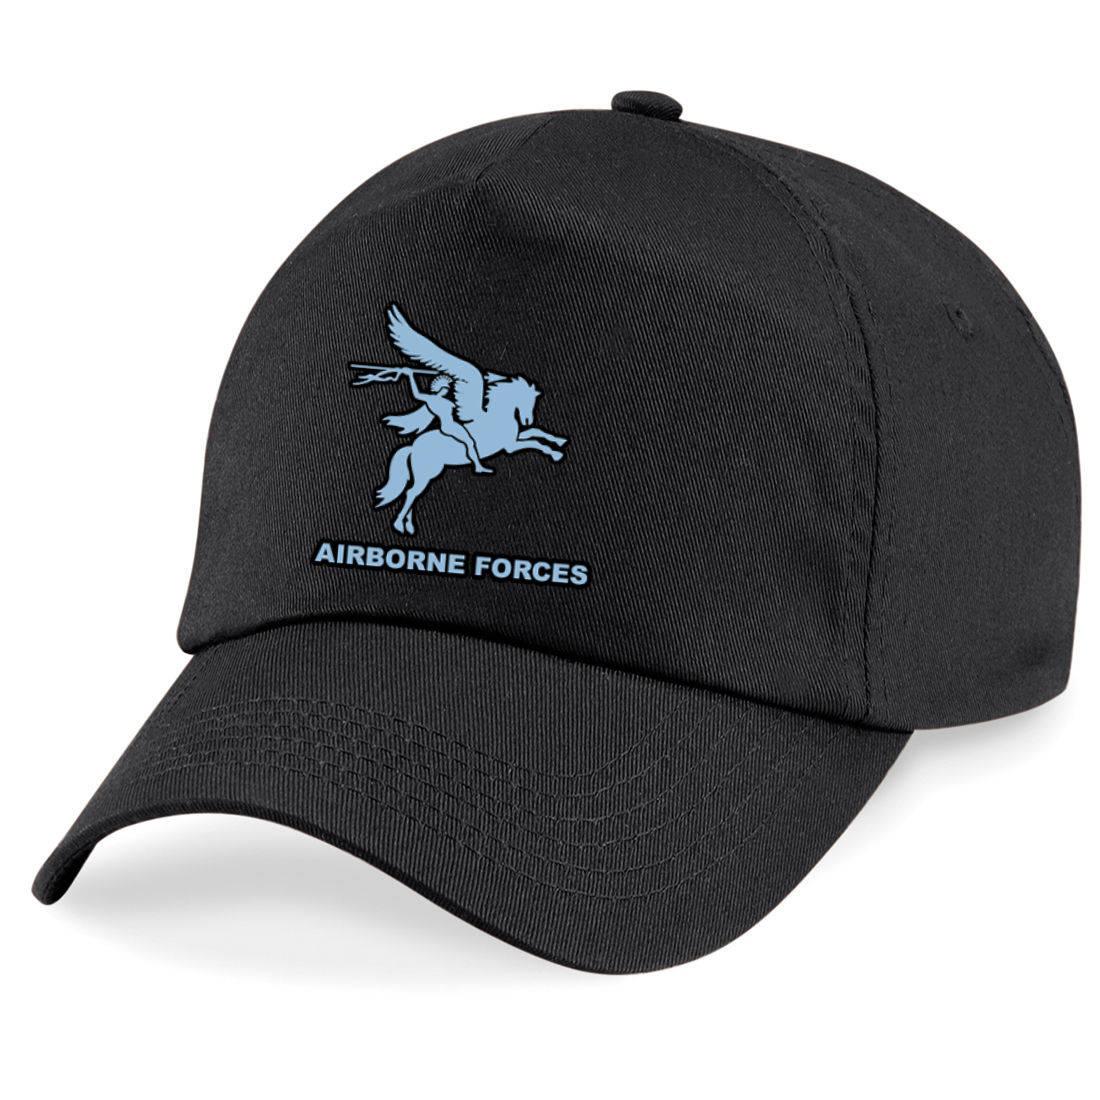 Baseball Cap - The Airborne Shop 3ad6323f17d5